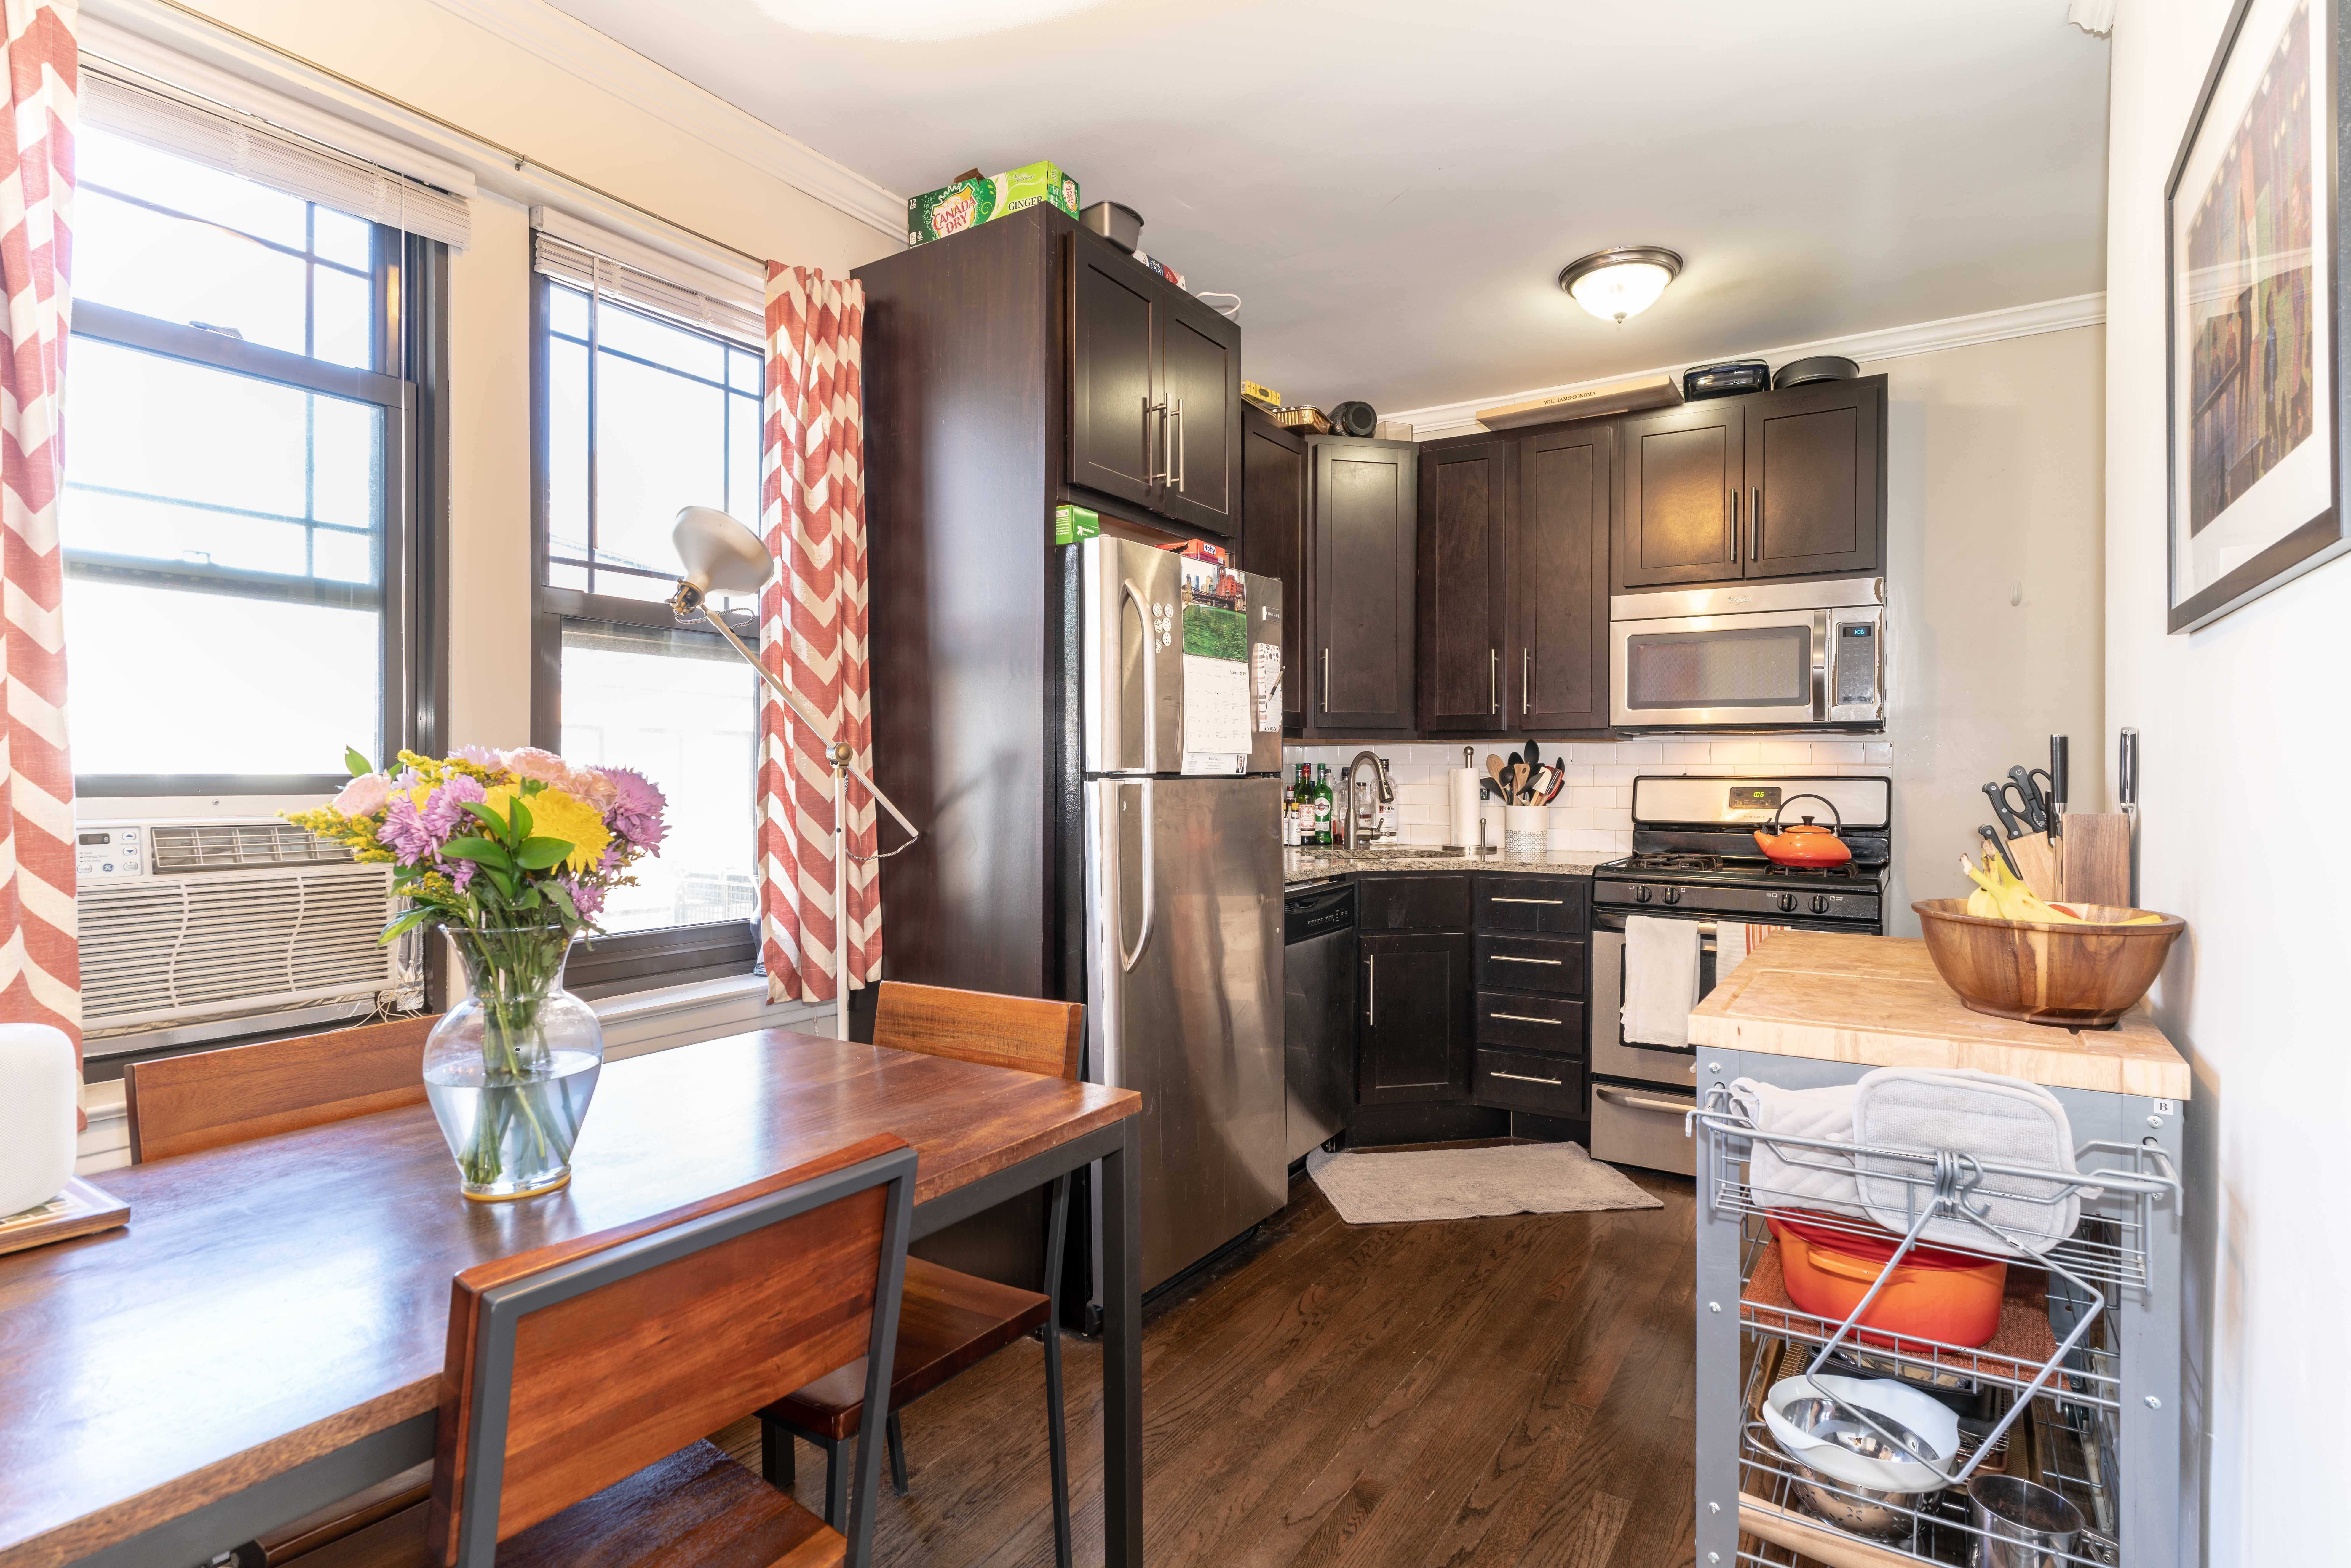 Contemporary kitchen with orange chevron curtains